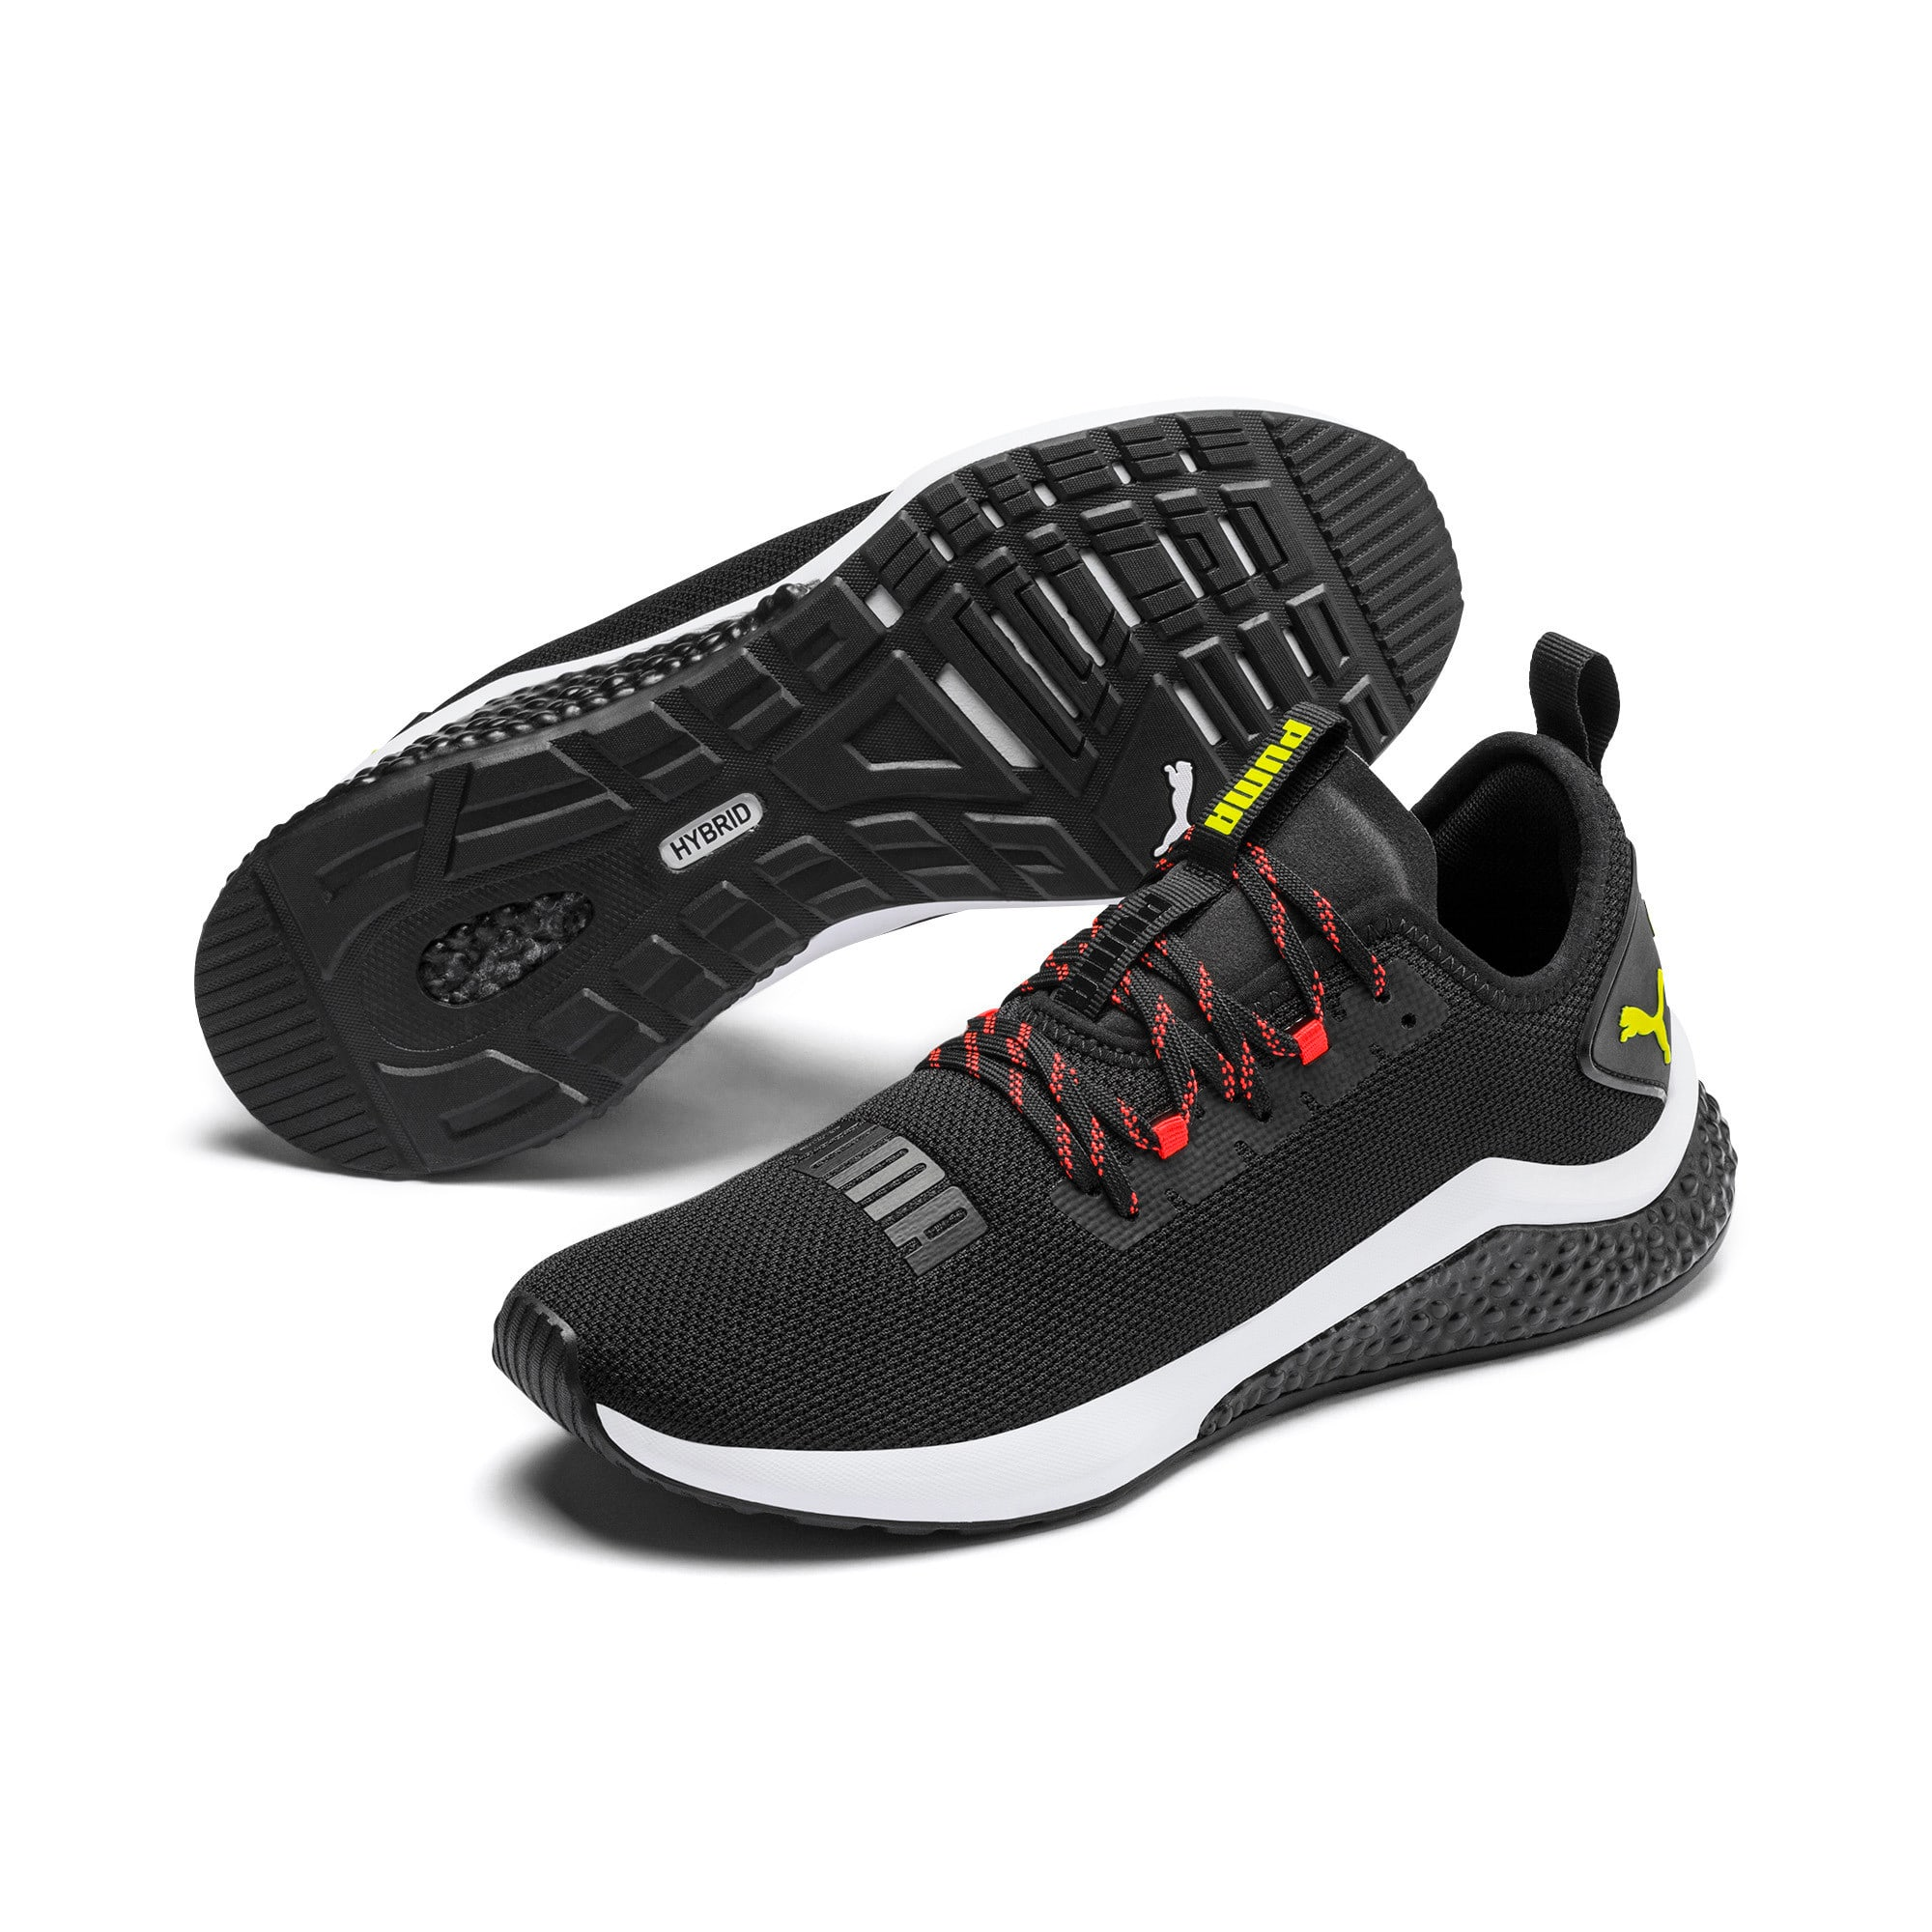 Thumbnail 3 of HYBRID NX Men's Running Shoes, Black-Nrgy Red-Yellow Alert, medium